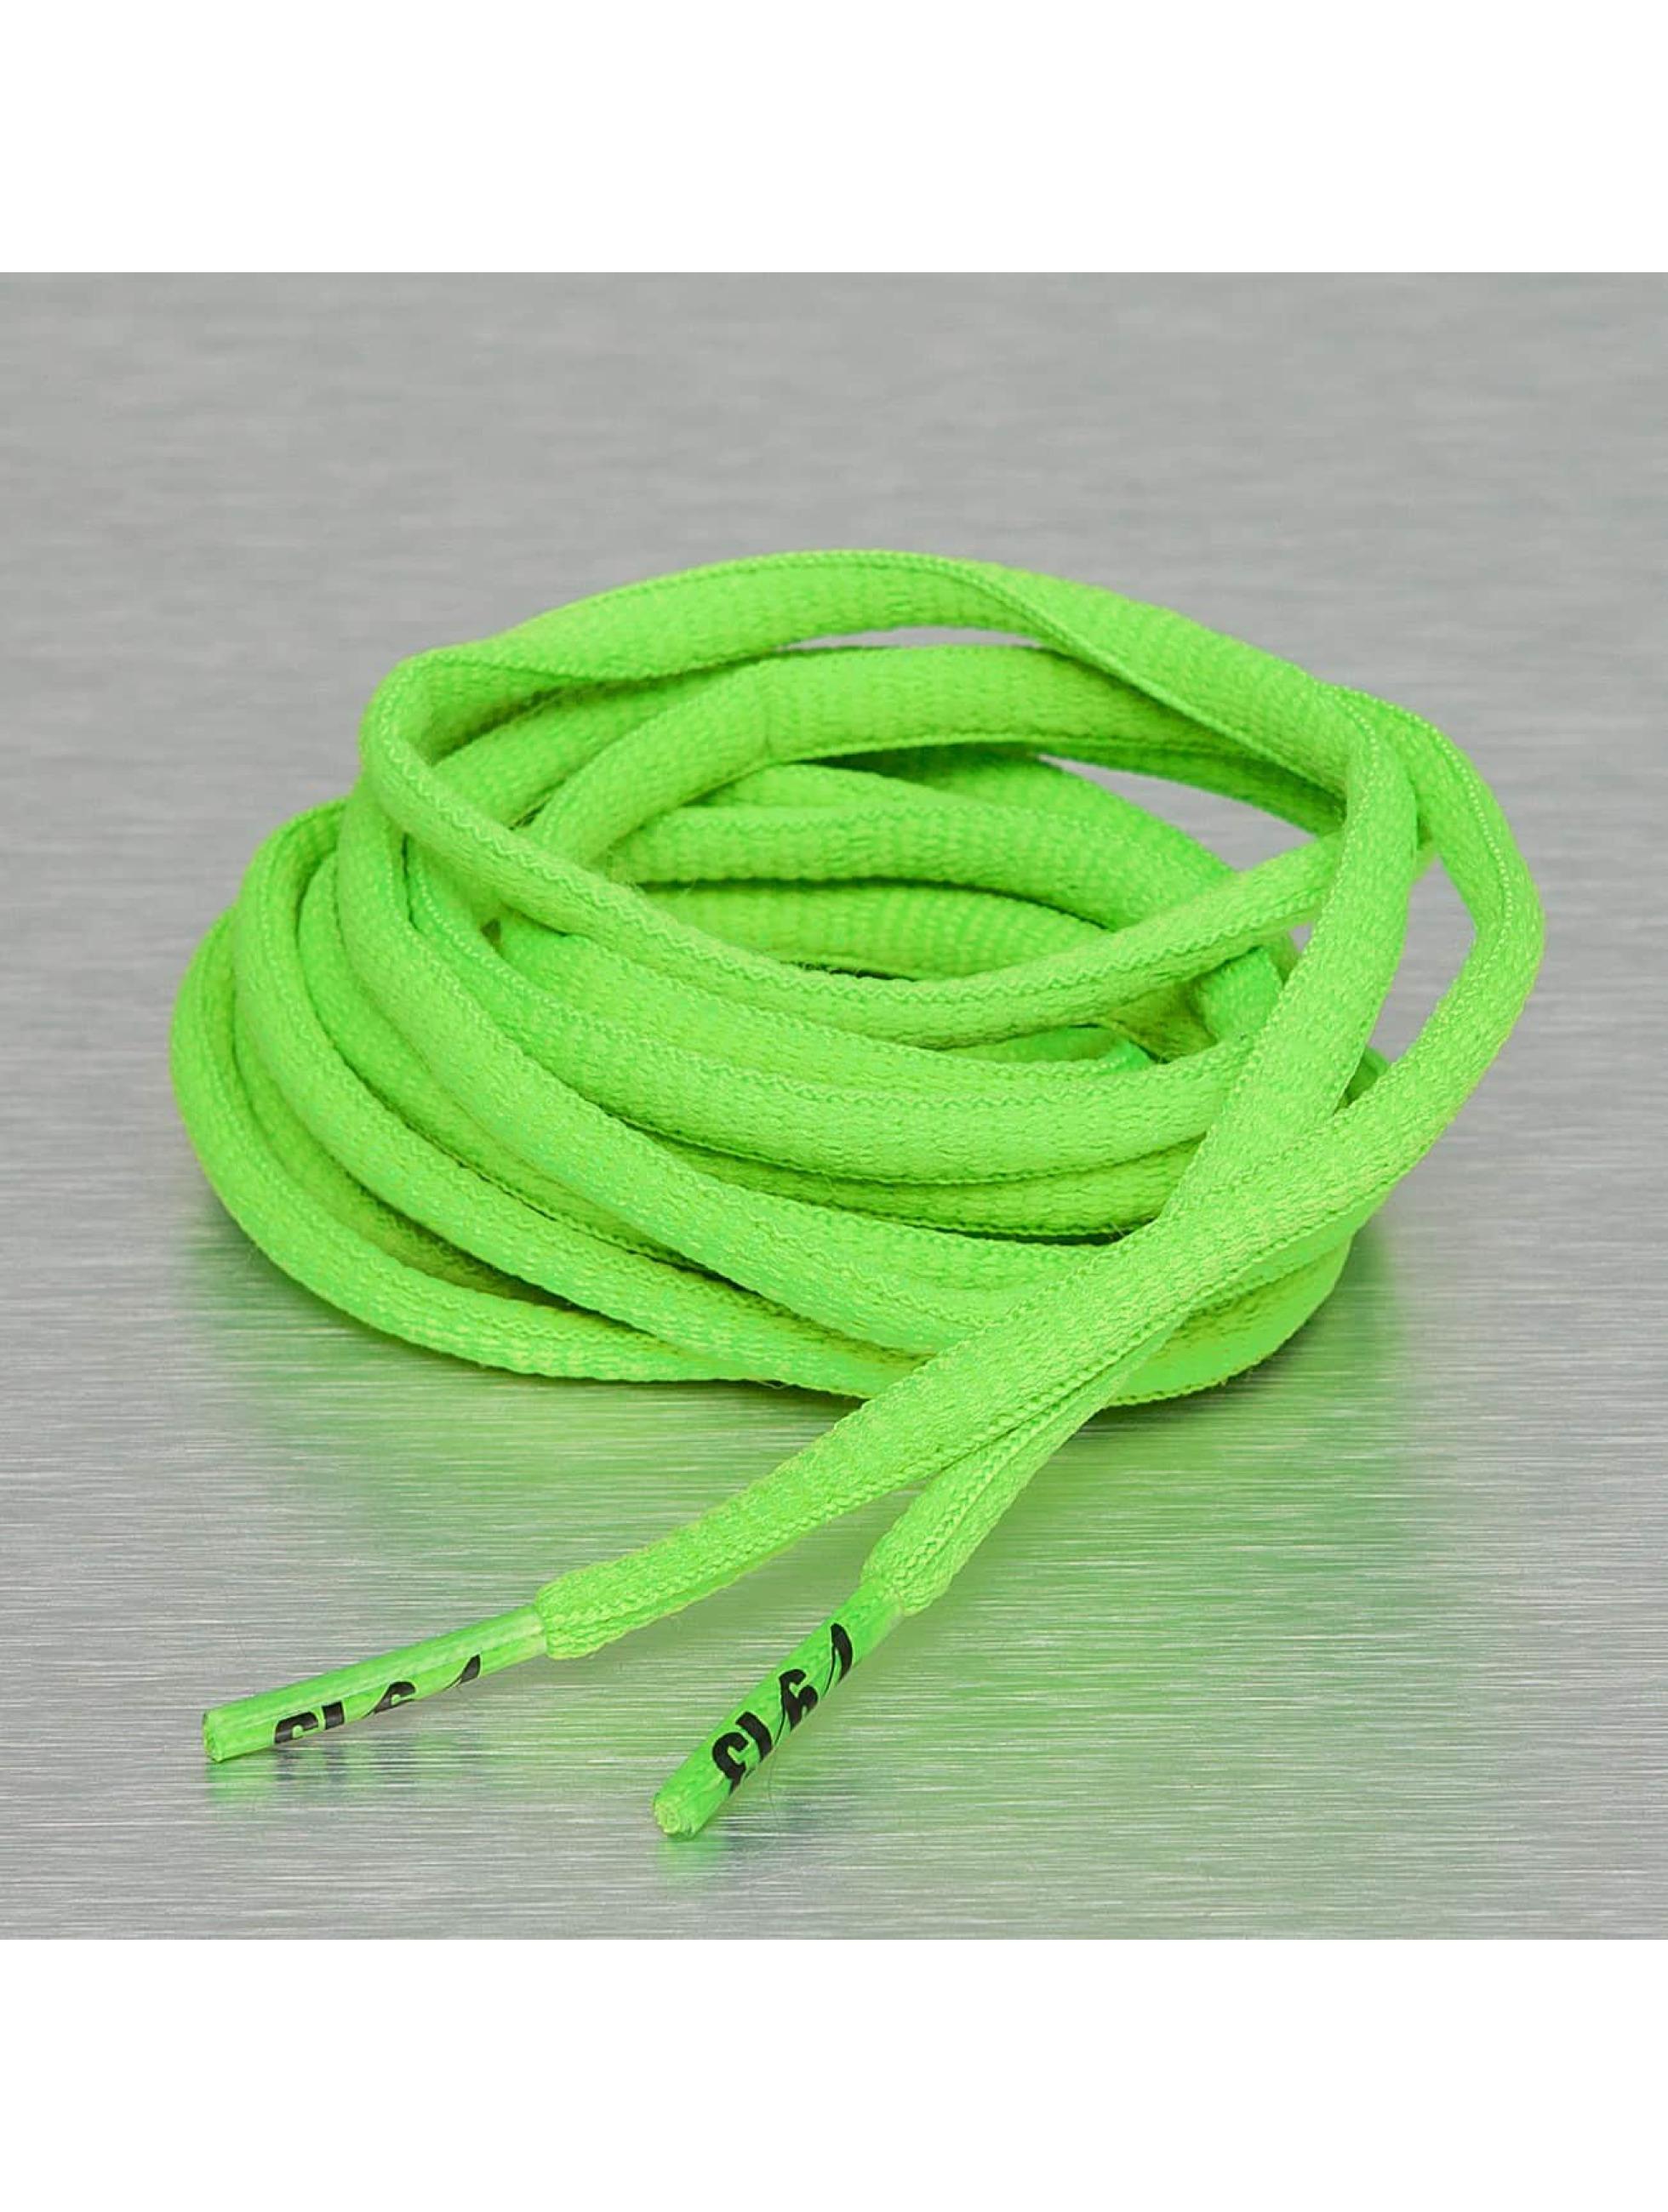 Seven Nine 13 Аксессуар для обуви Hard Candy Round зеленый